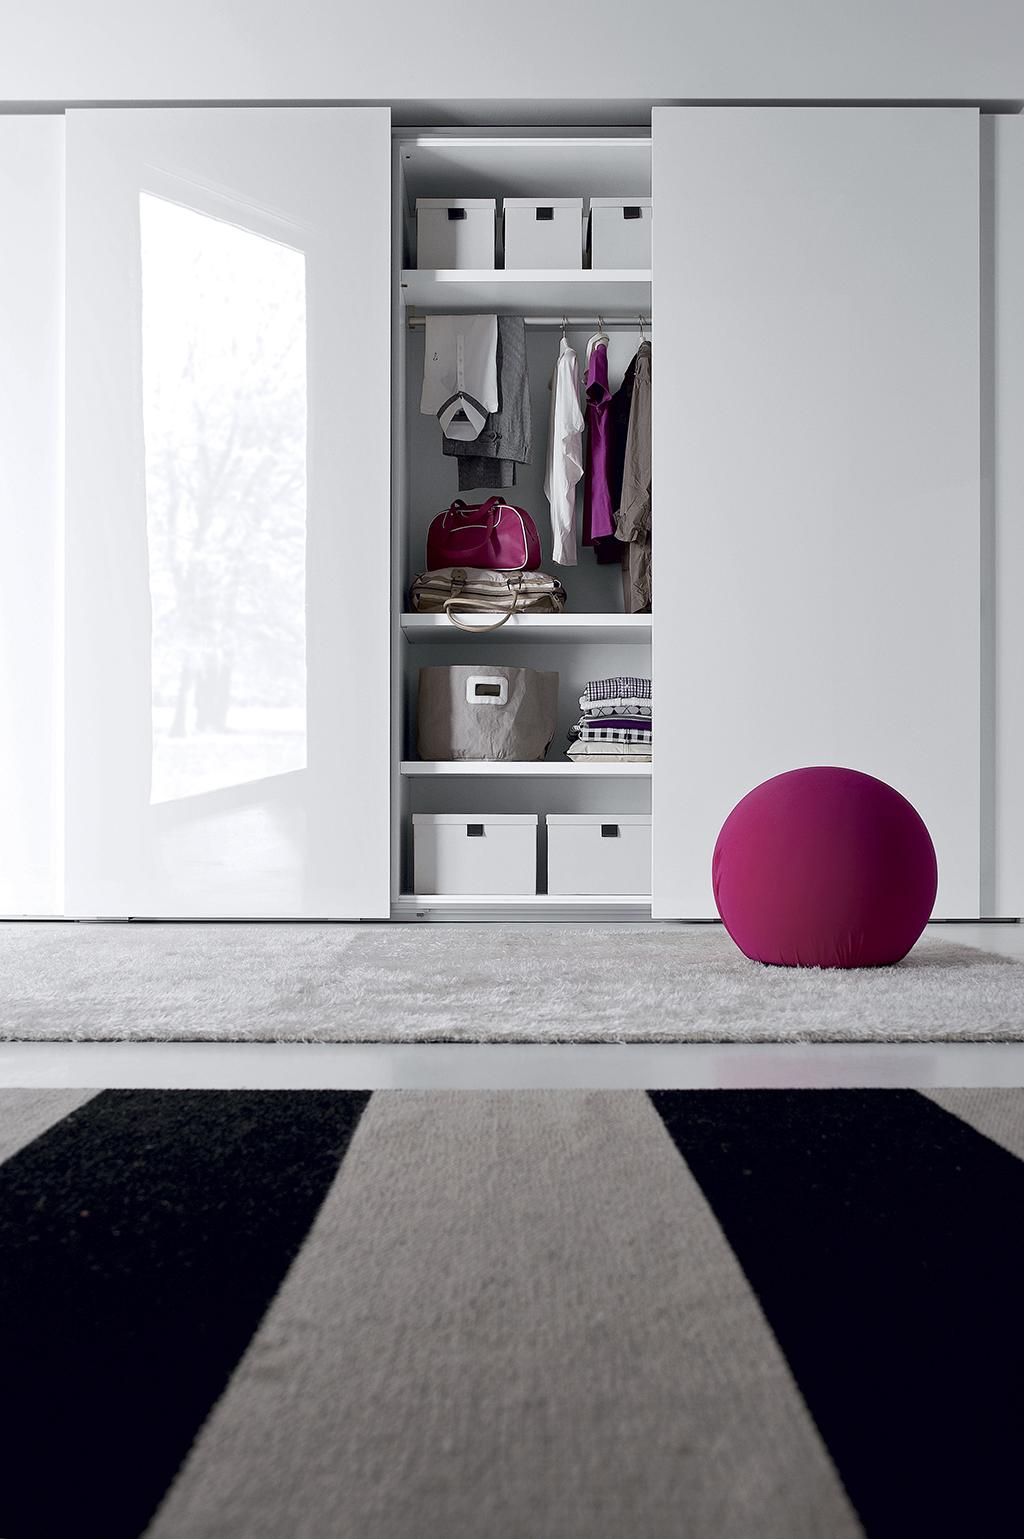 amore 071 fitted bedroom furniture wardrobes uk lawrence walsh furniture. Black Bedroom Furniture Sets. Home Design Ideas